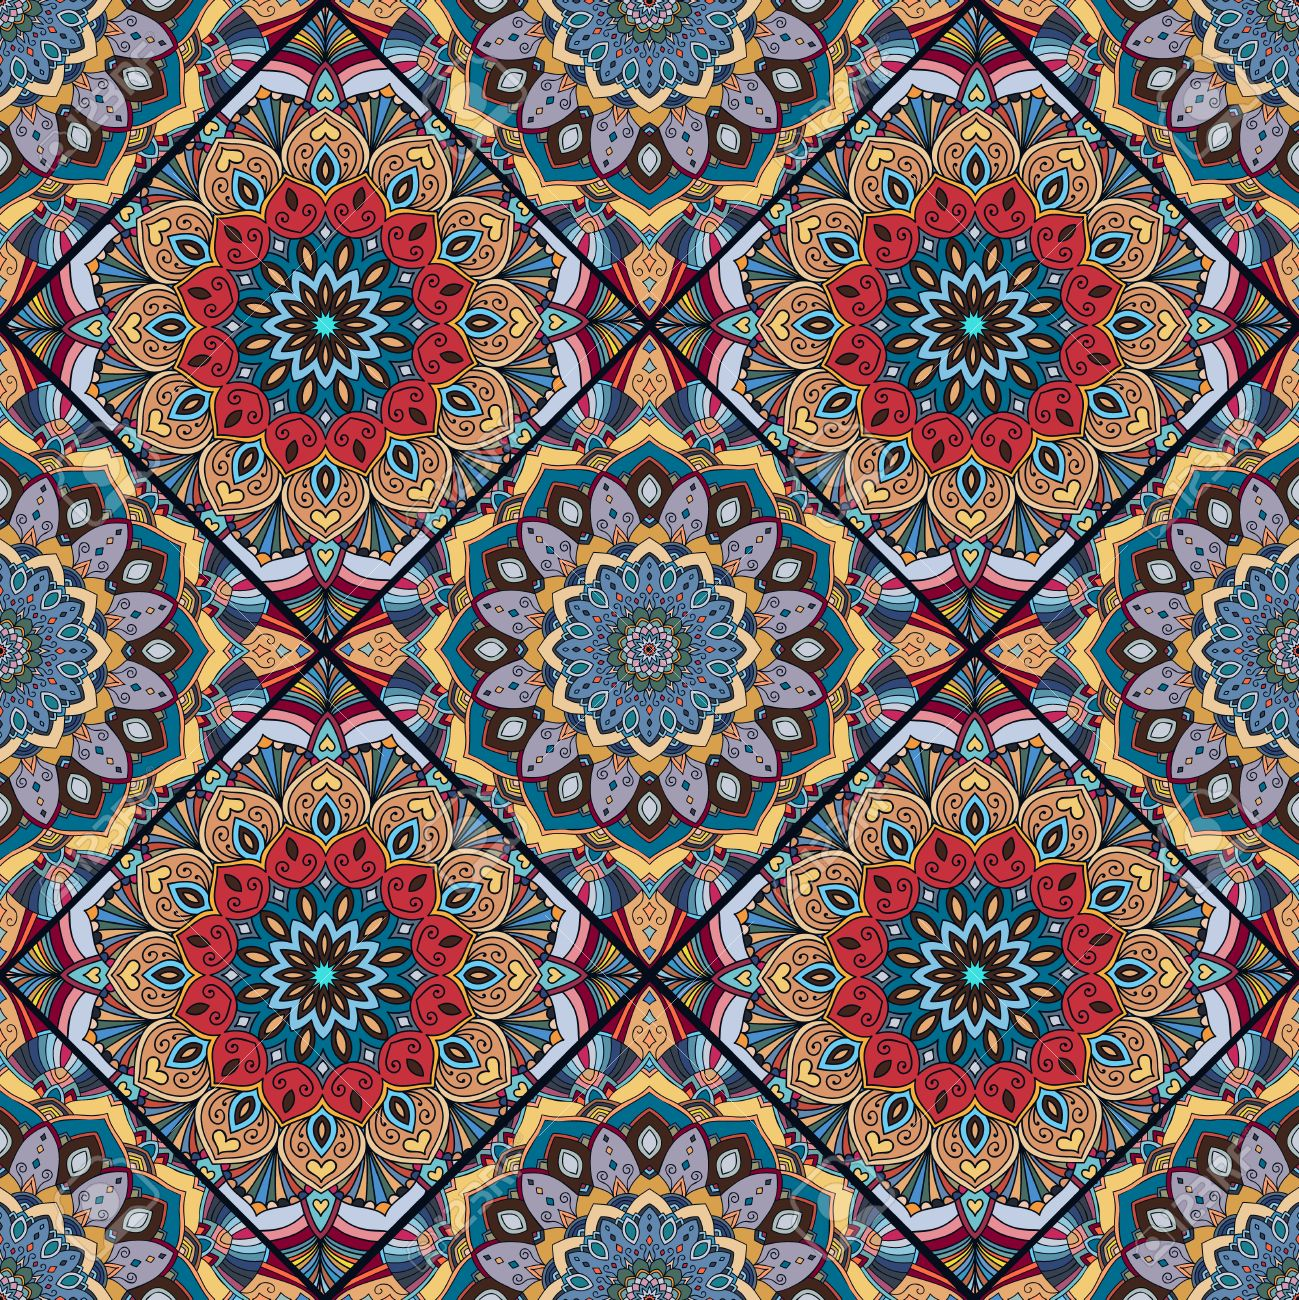 Muebles Hippies Elementos Florales Hippie De Diseo Oriental  # Muebles Hippies